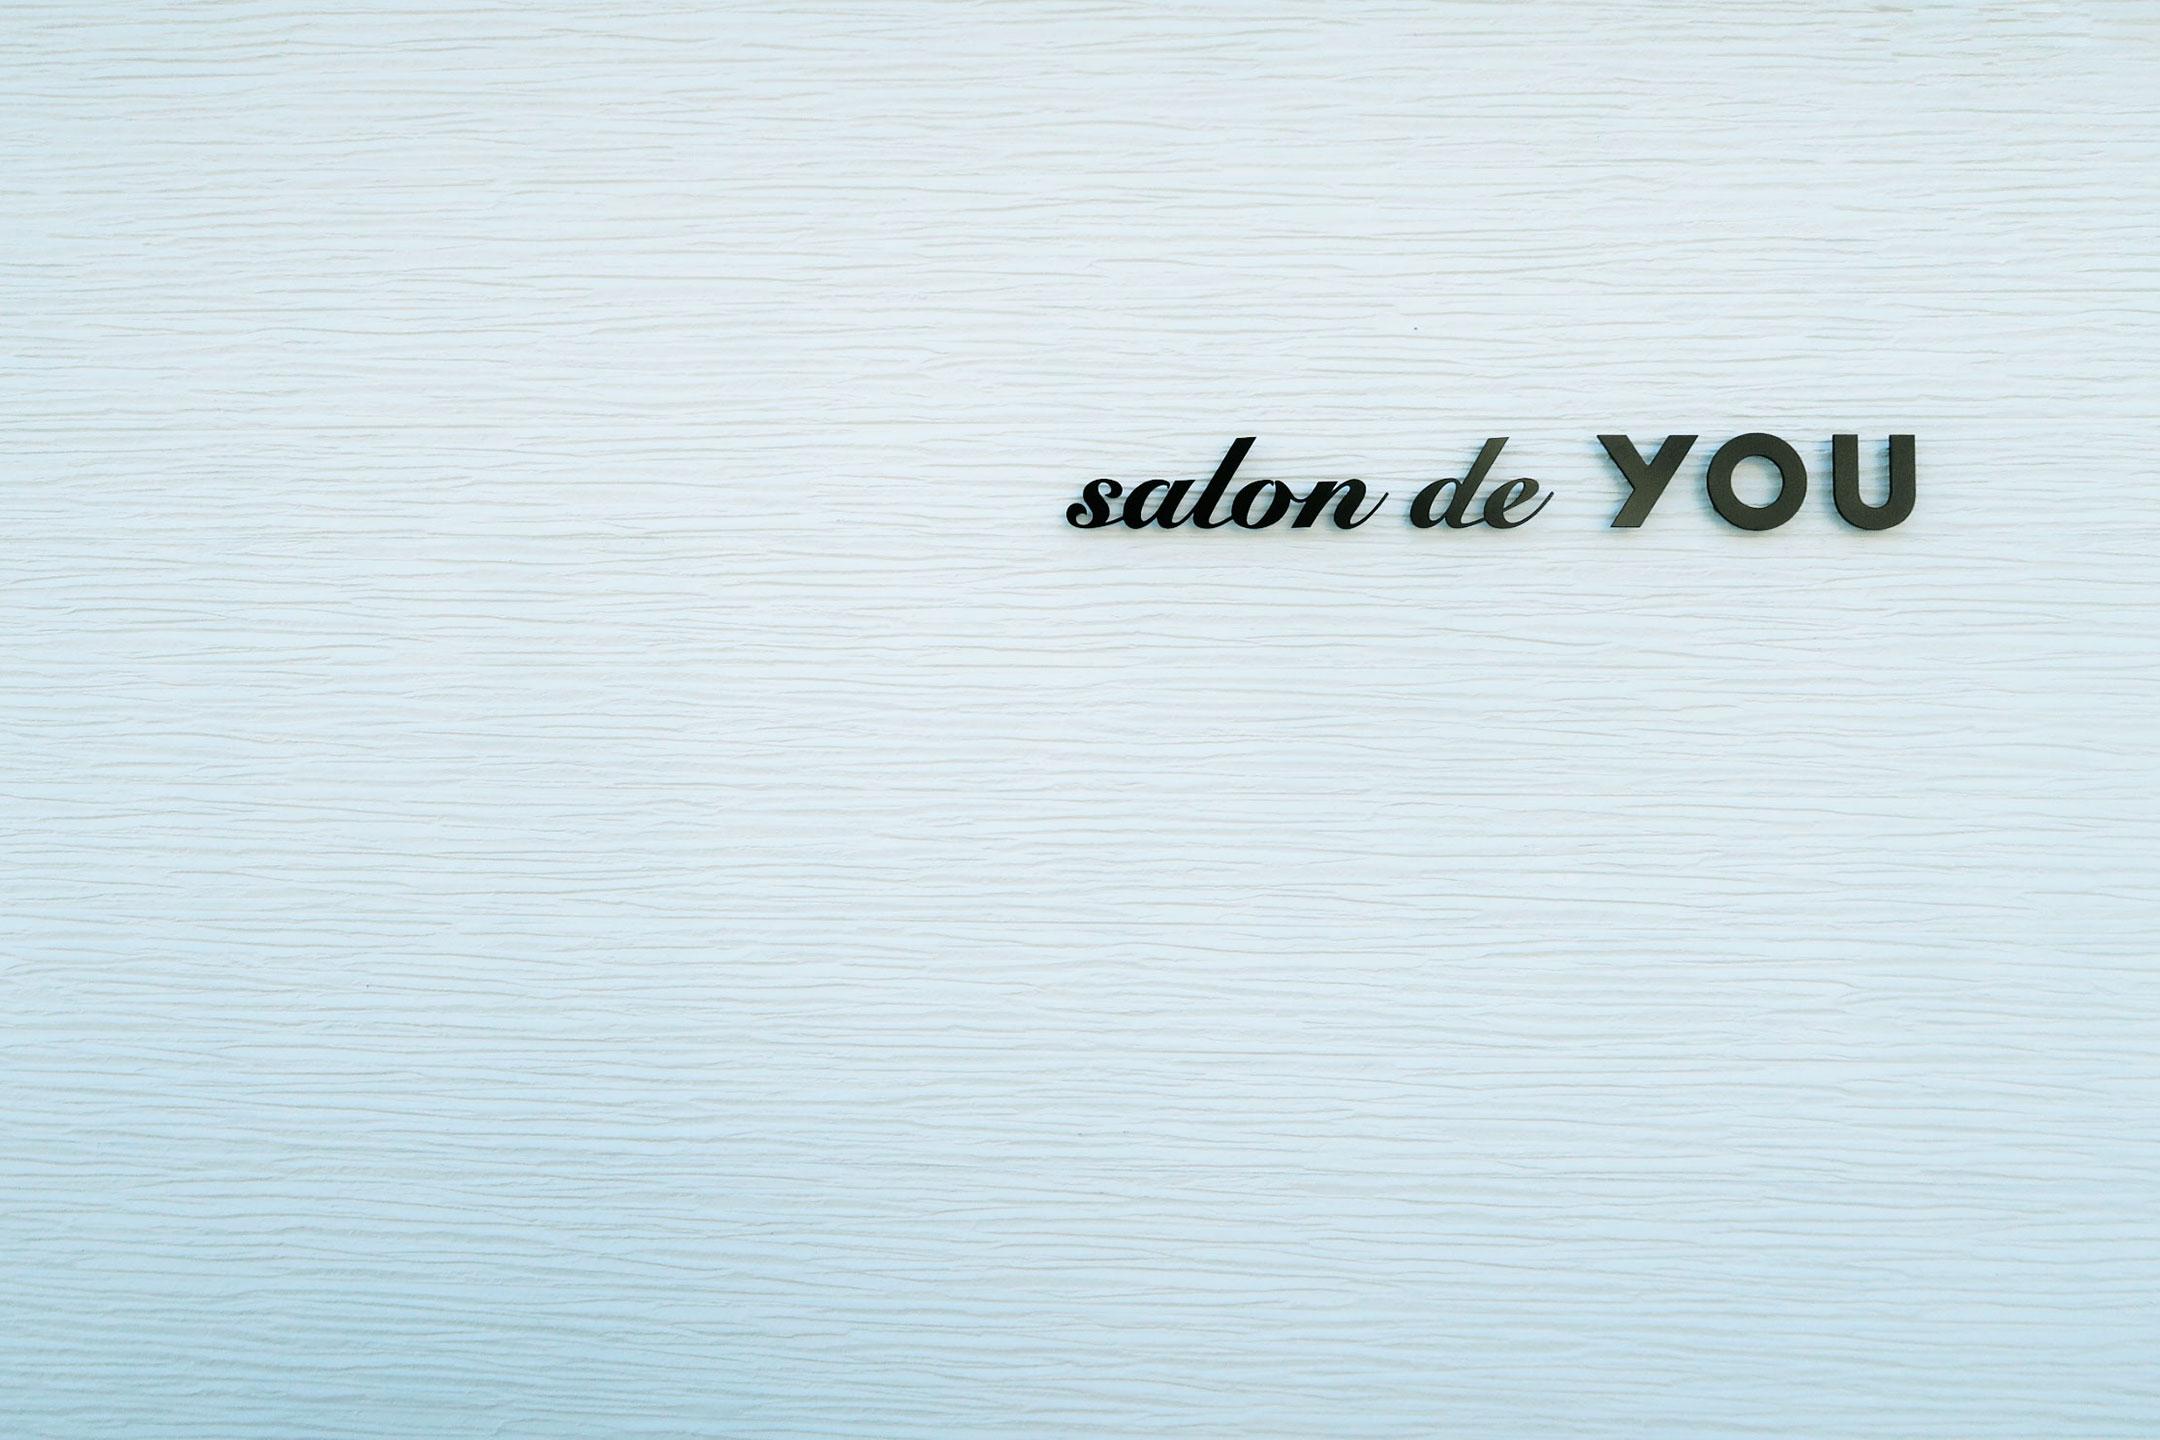 salon de YOU 2